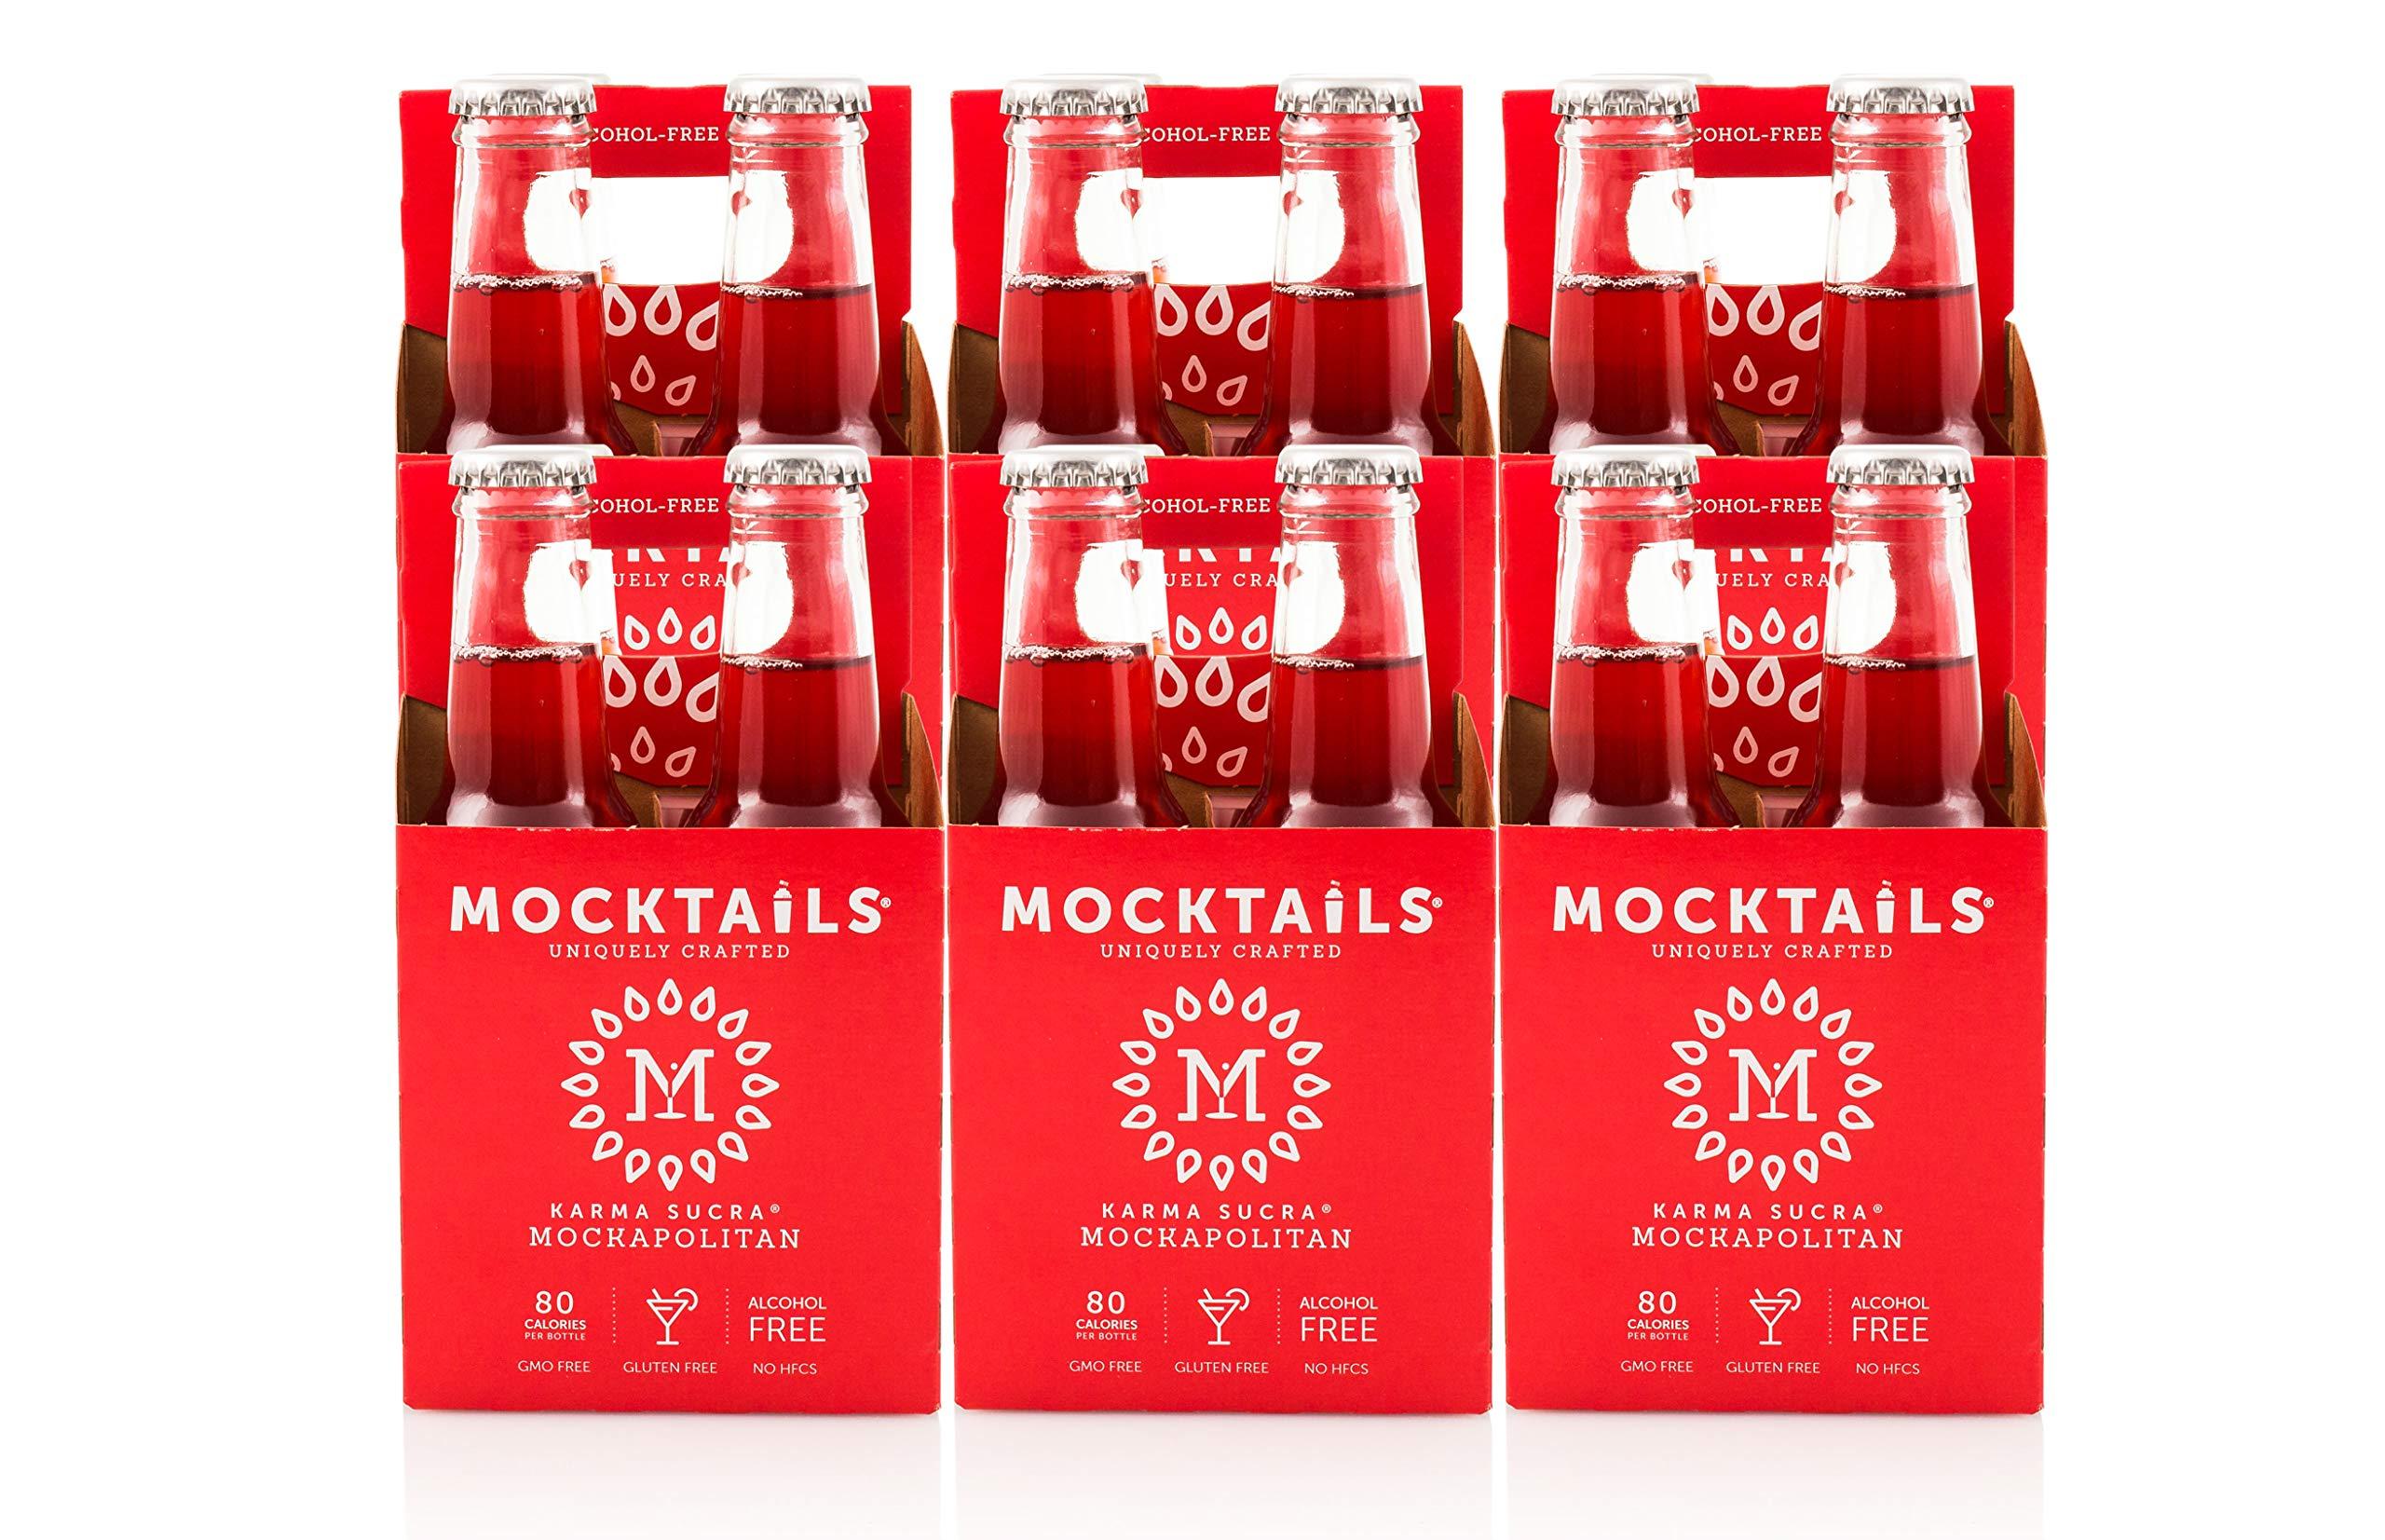 Mocktails Uniquely Crafted Alcohol Free Karma Sucra Mockapolitan, 6.8 fl. oz. (Pack of 24)